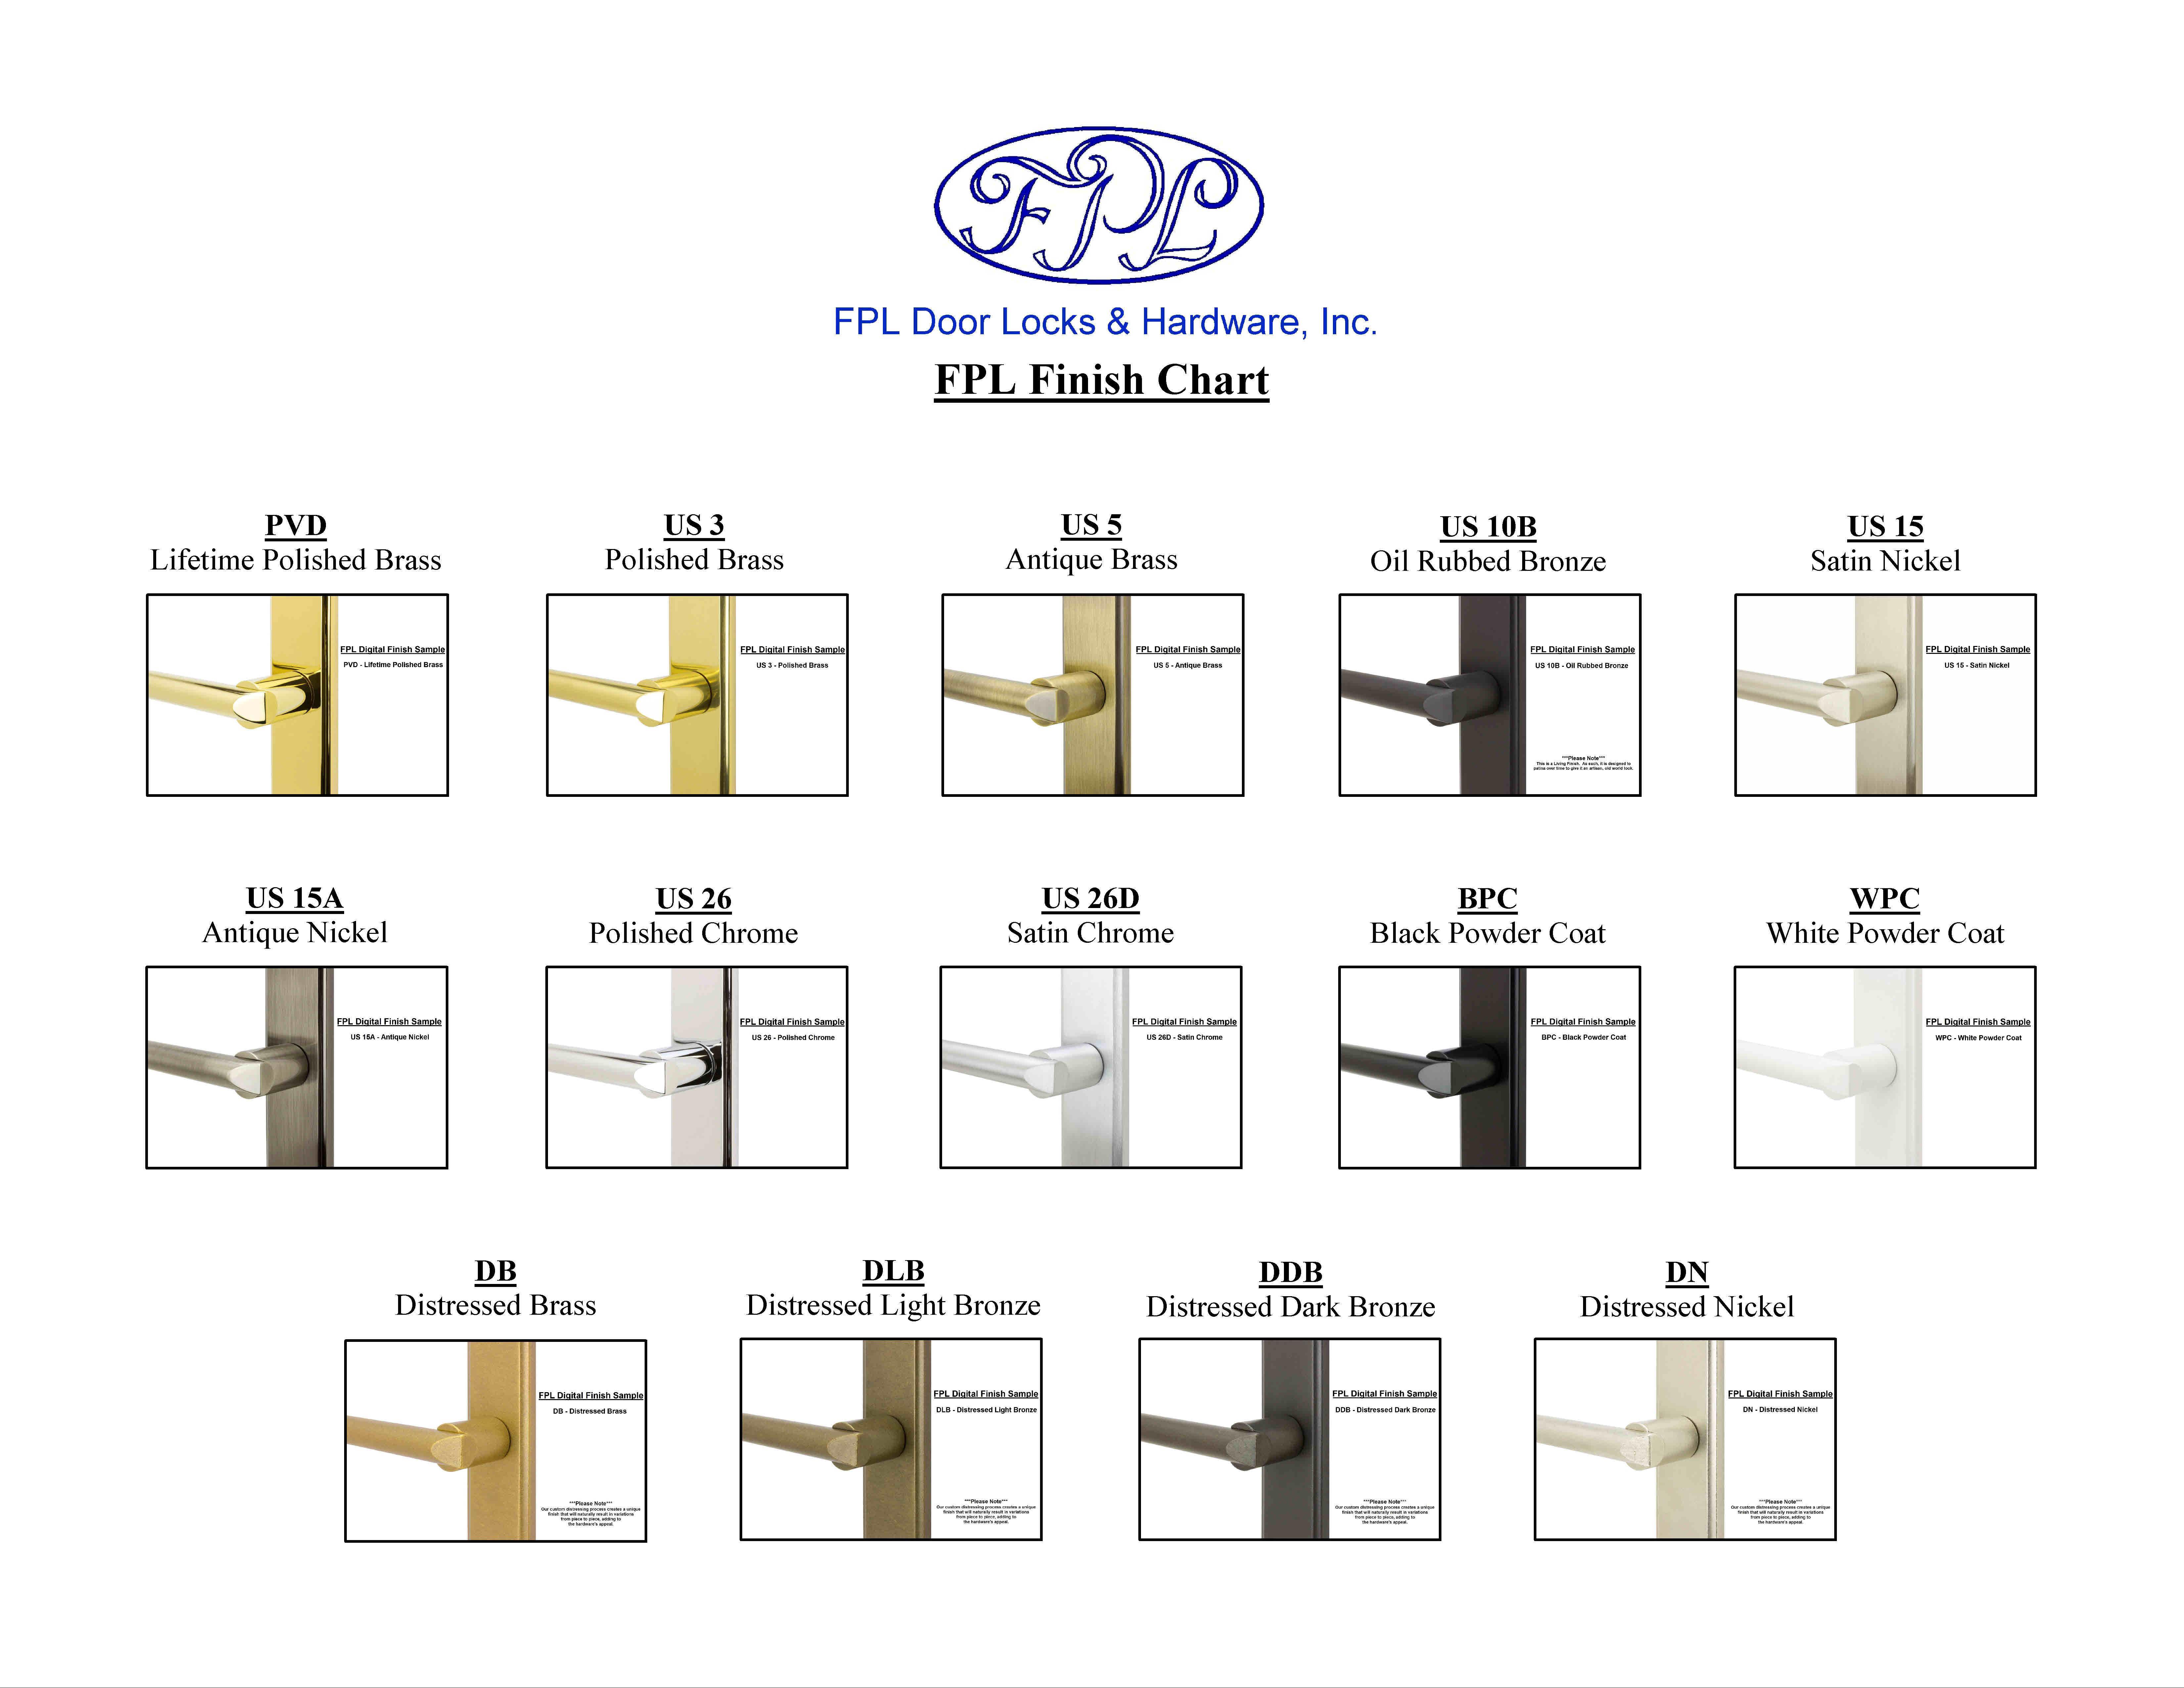 FPL Digital Finish Chart